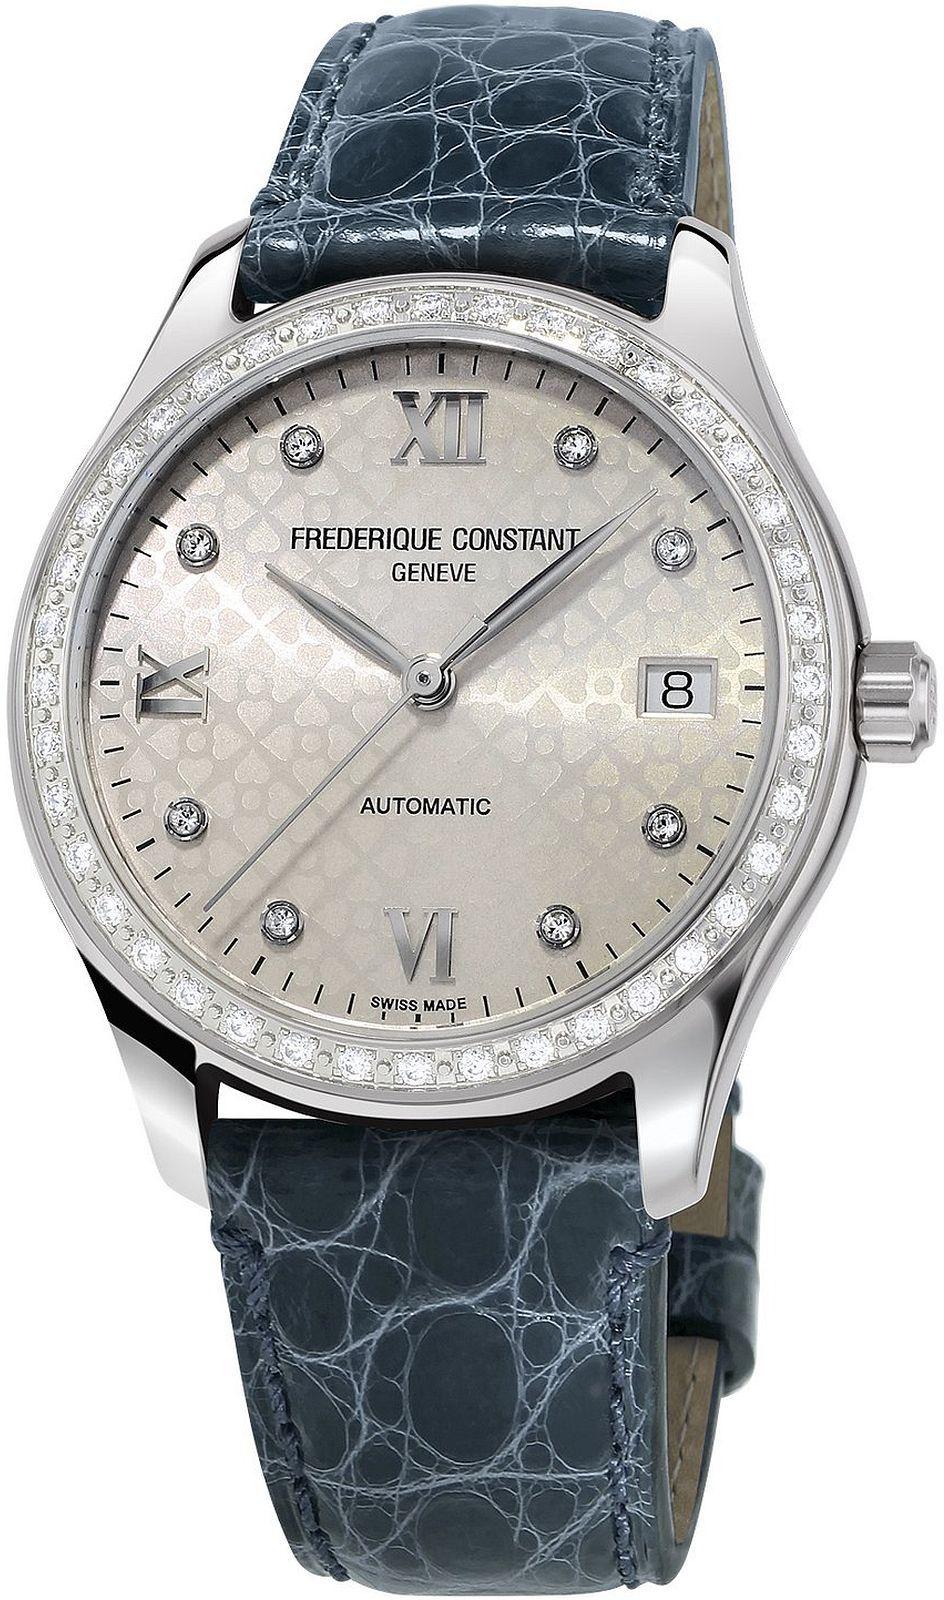 Zegarek damski Frederique Constant Ladies Automatic